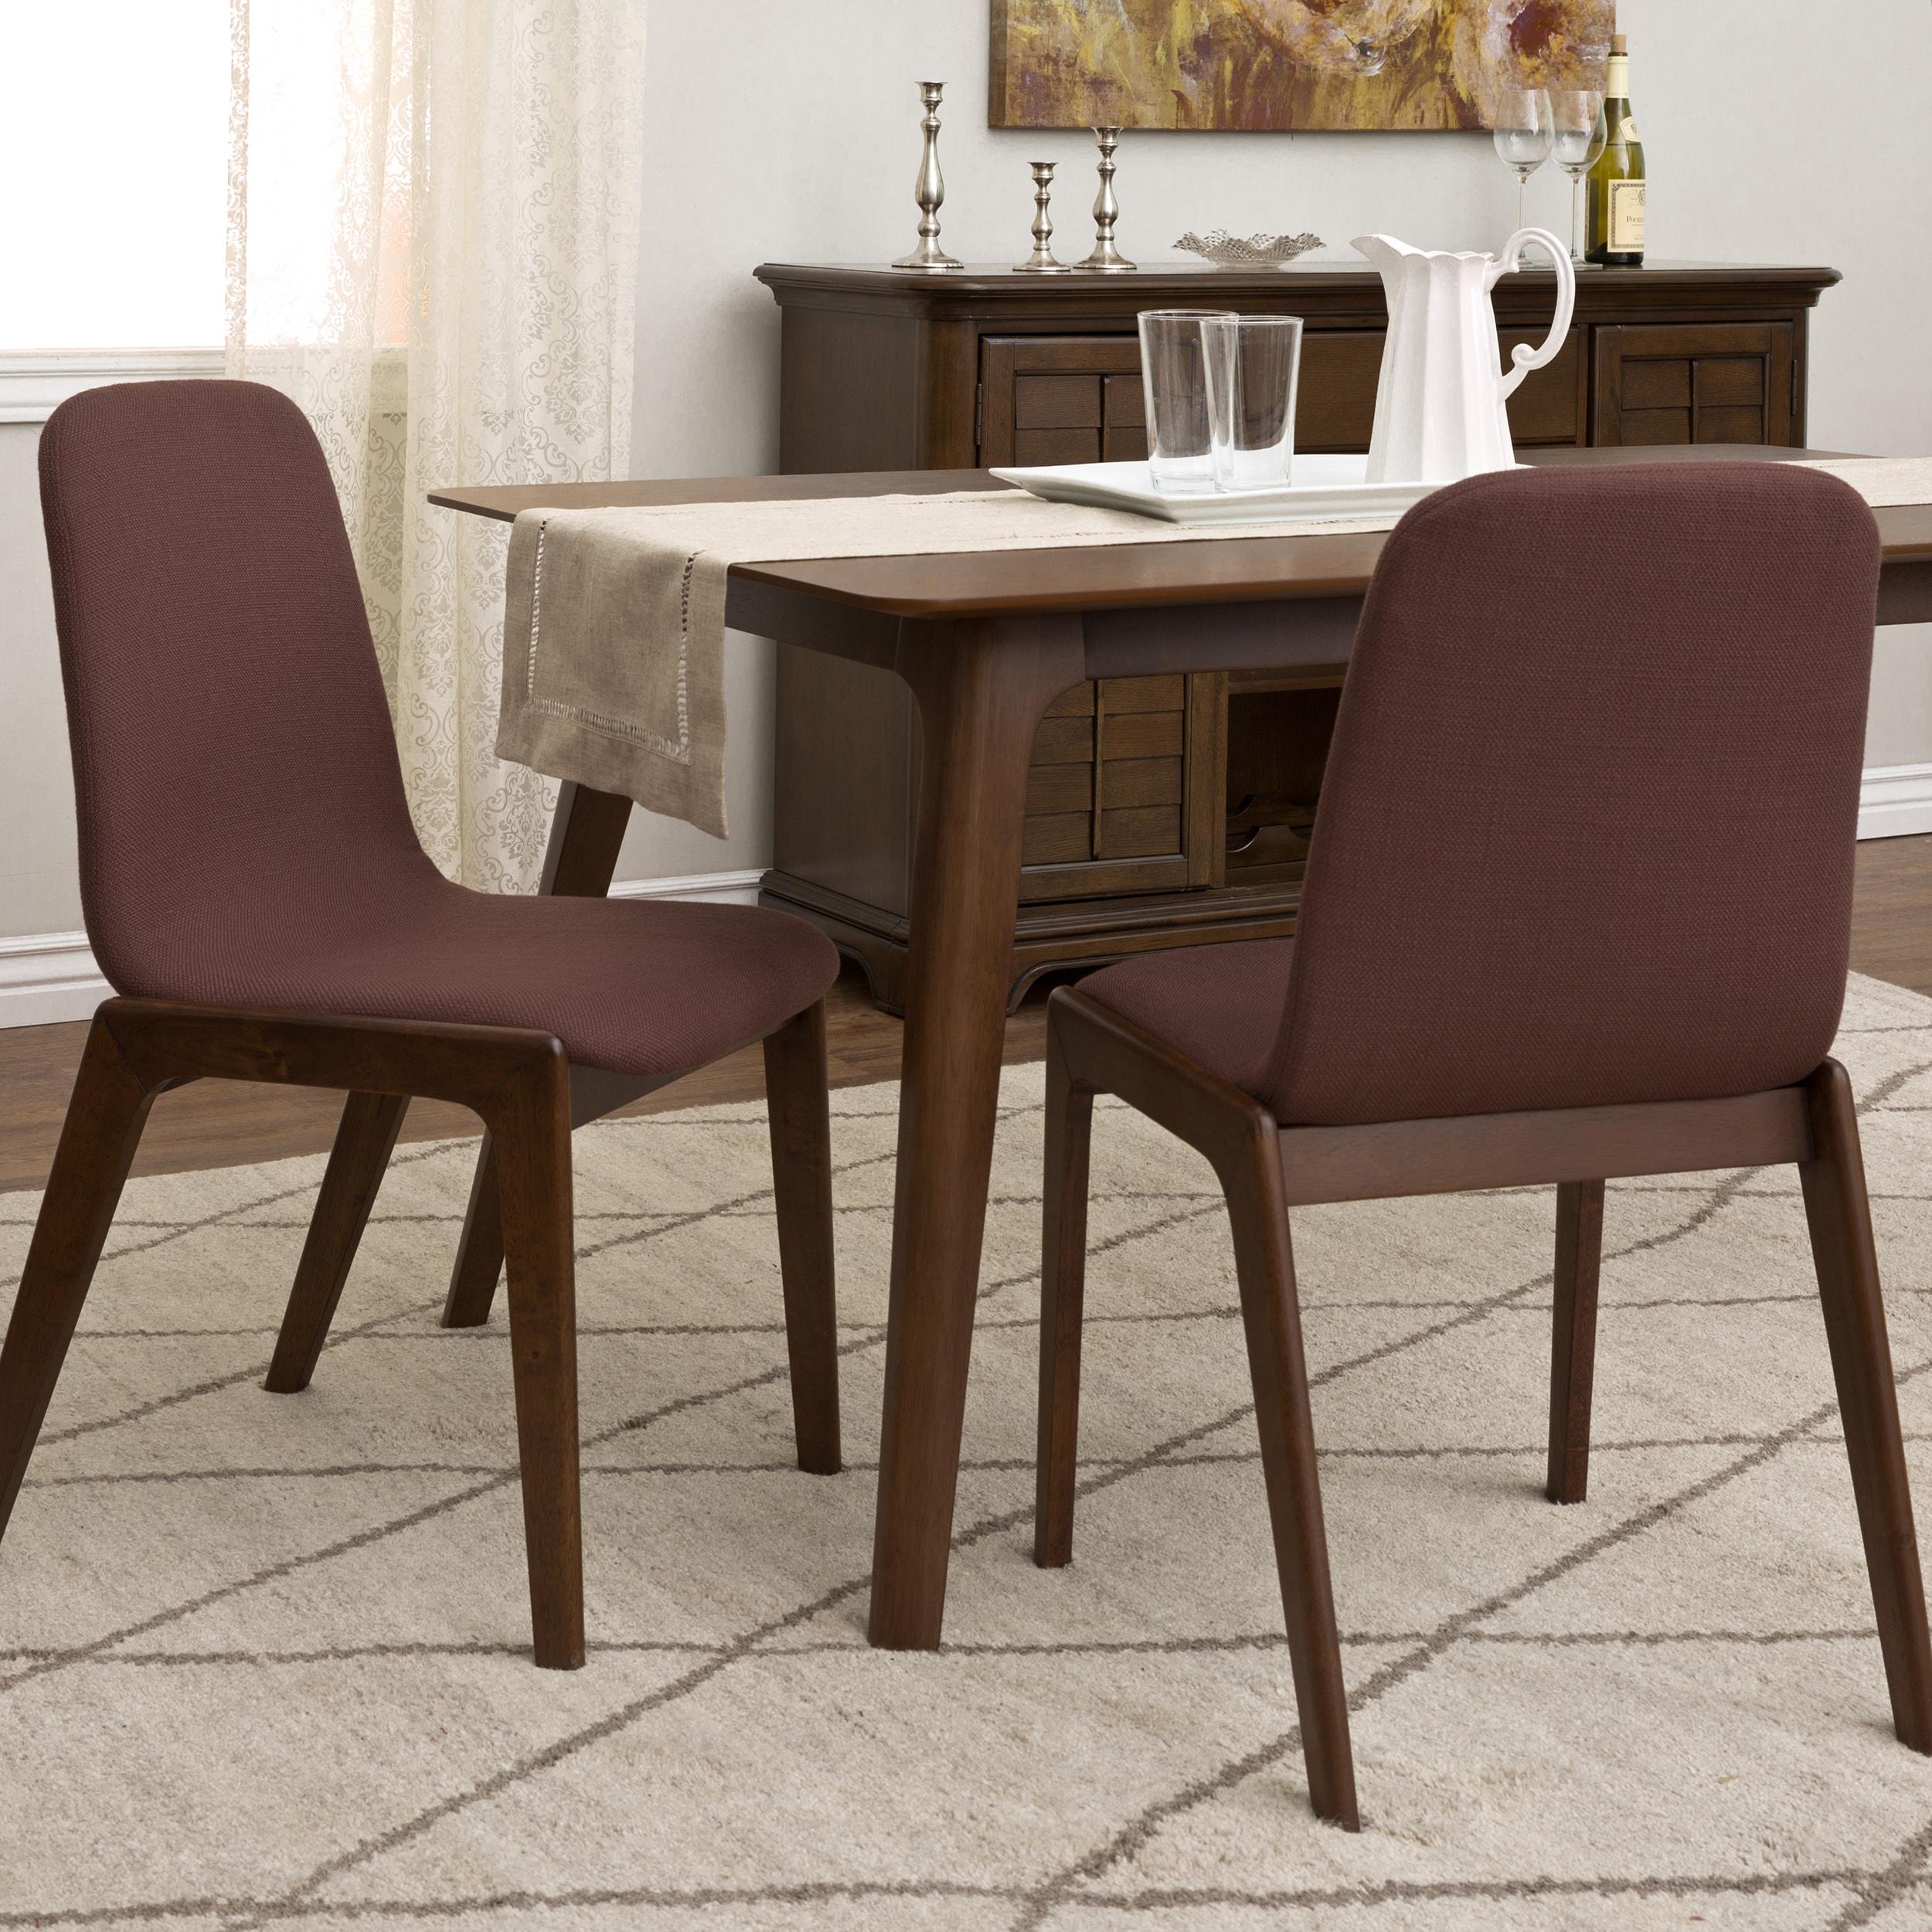 Libra Basket Weave Raisin Dining Chairs Set Of 2 Overstock 10180700